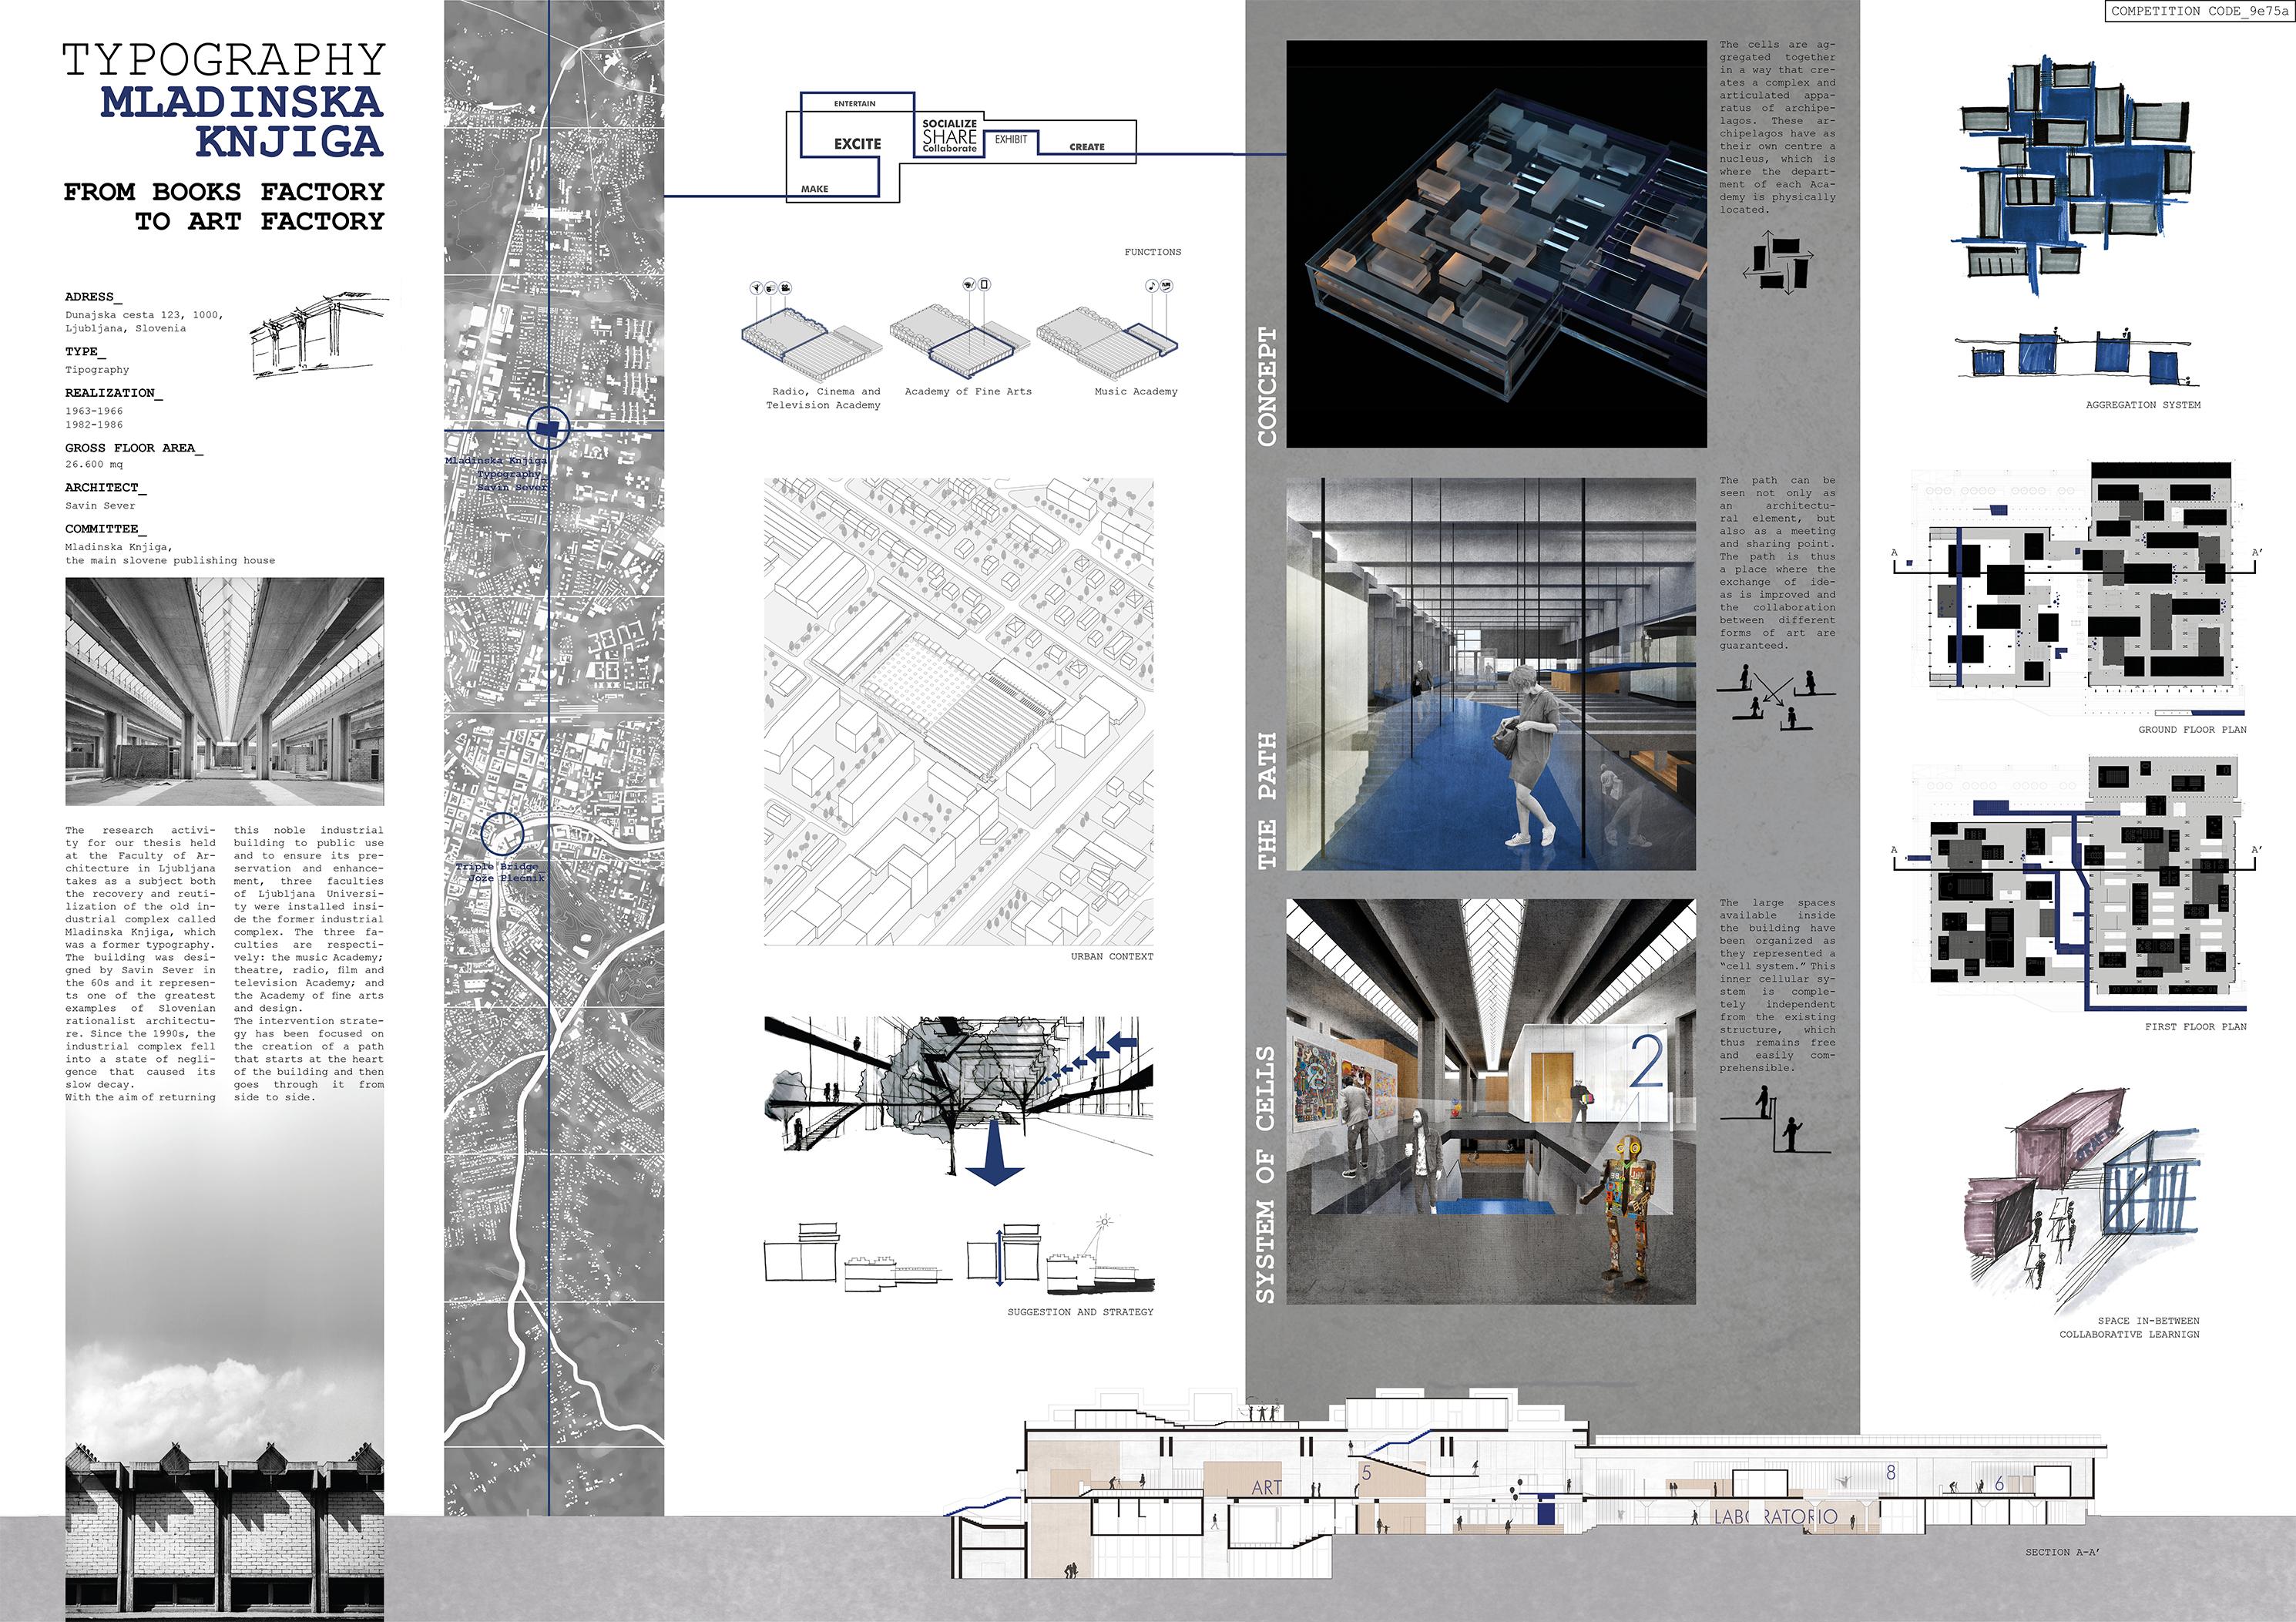 Typography Mladinska Knjiga, from Books Factory to Art Factory Board